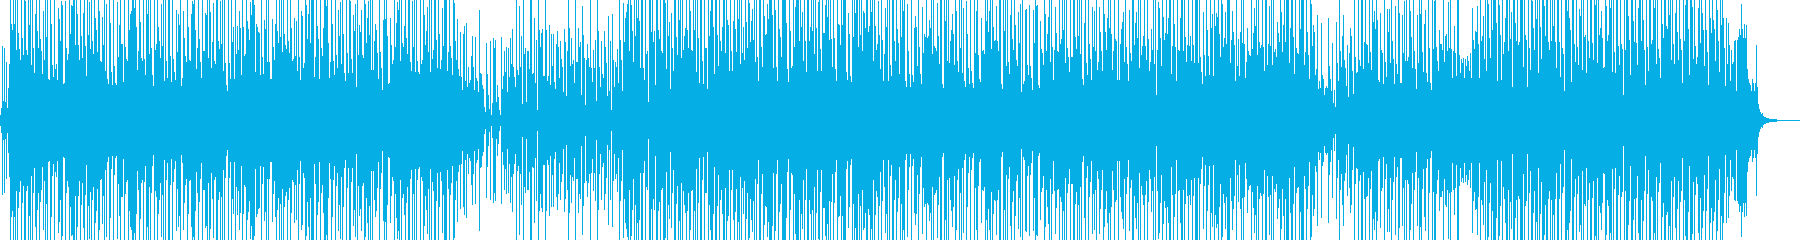 Reggae Pop of Vacation Image C's reproduced waveform